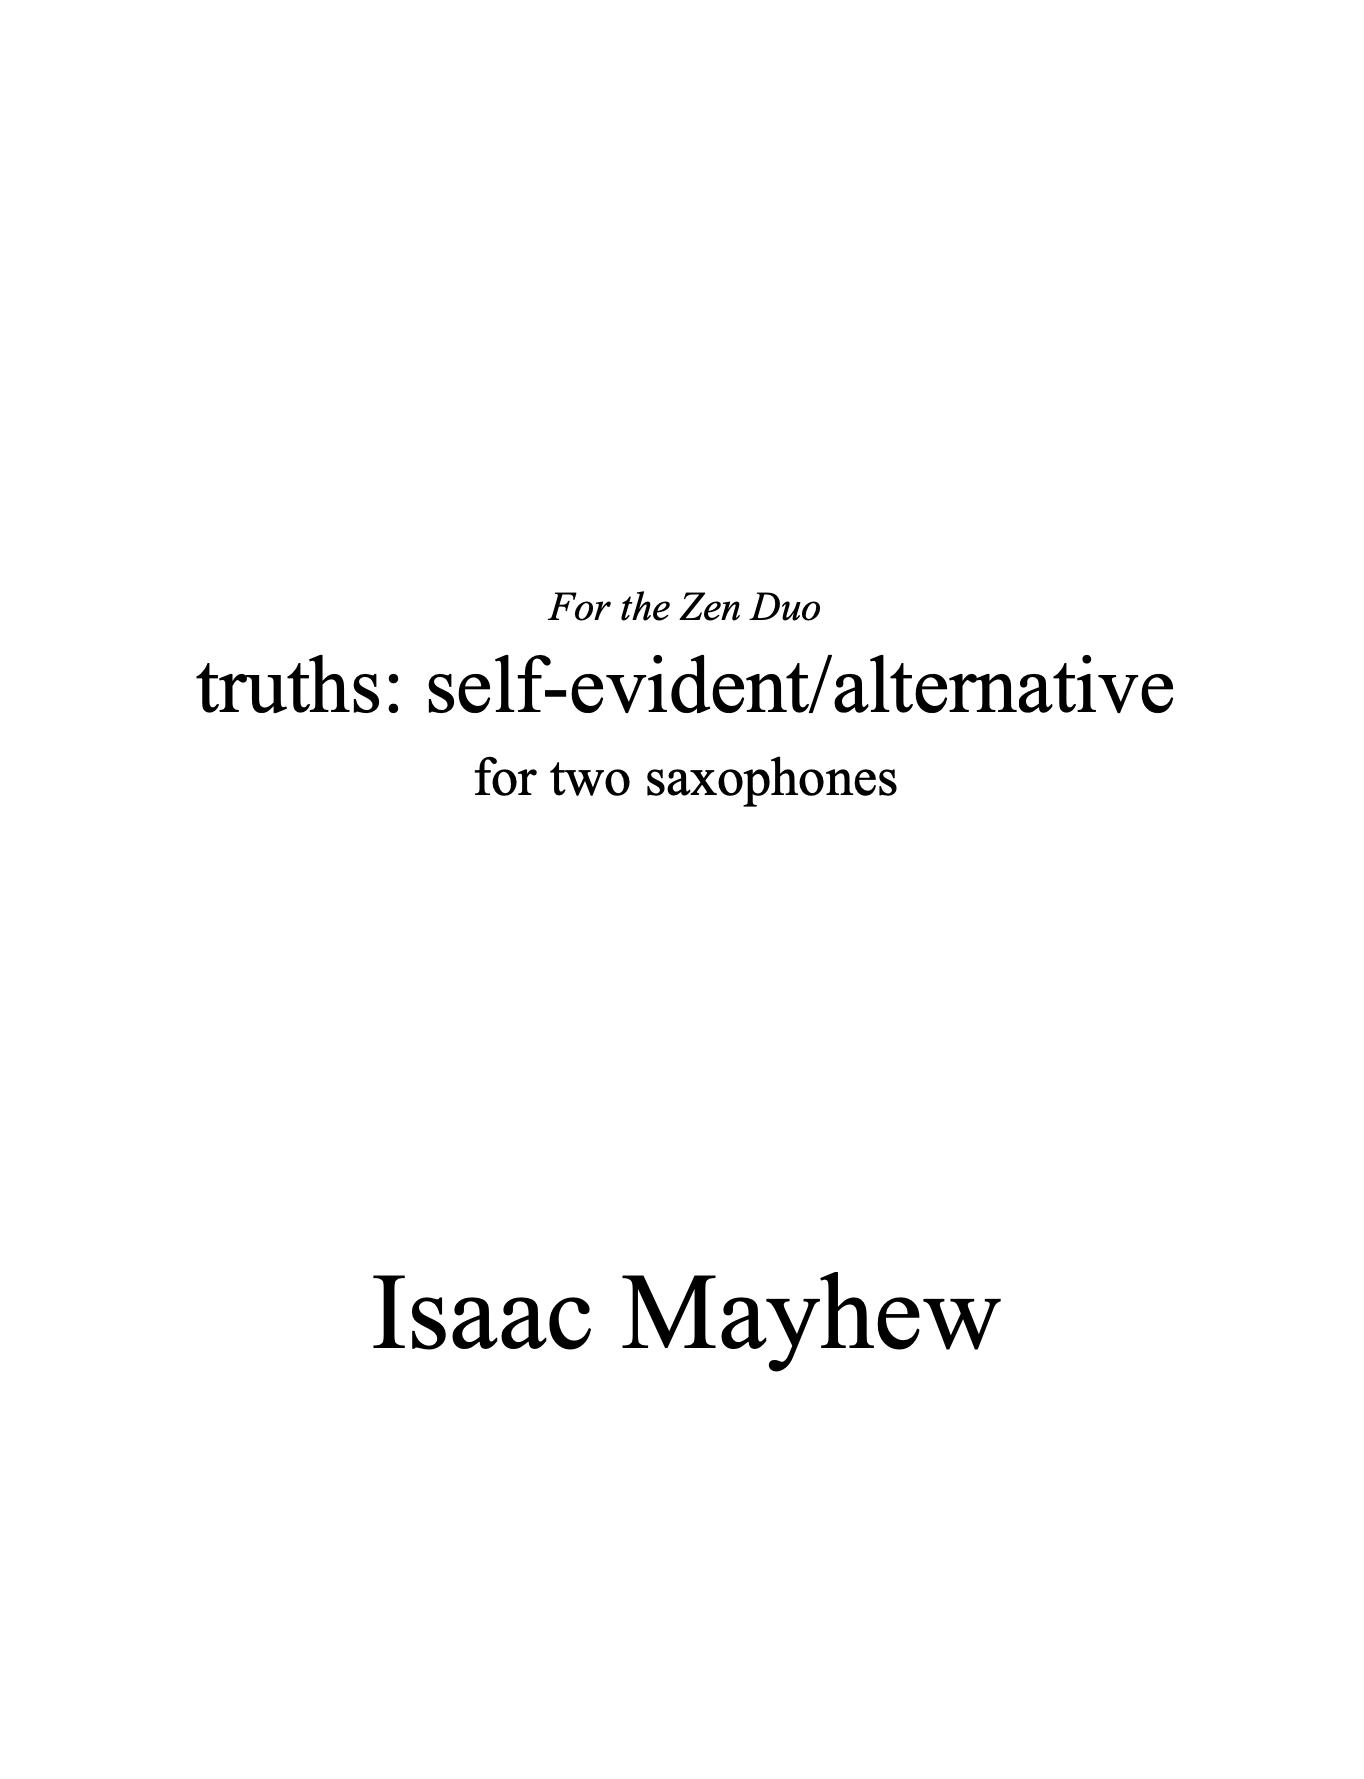 Truths: Self-evident/alternative by Isaac Mayhew